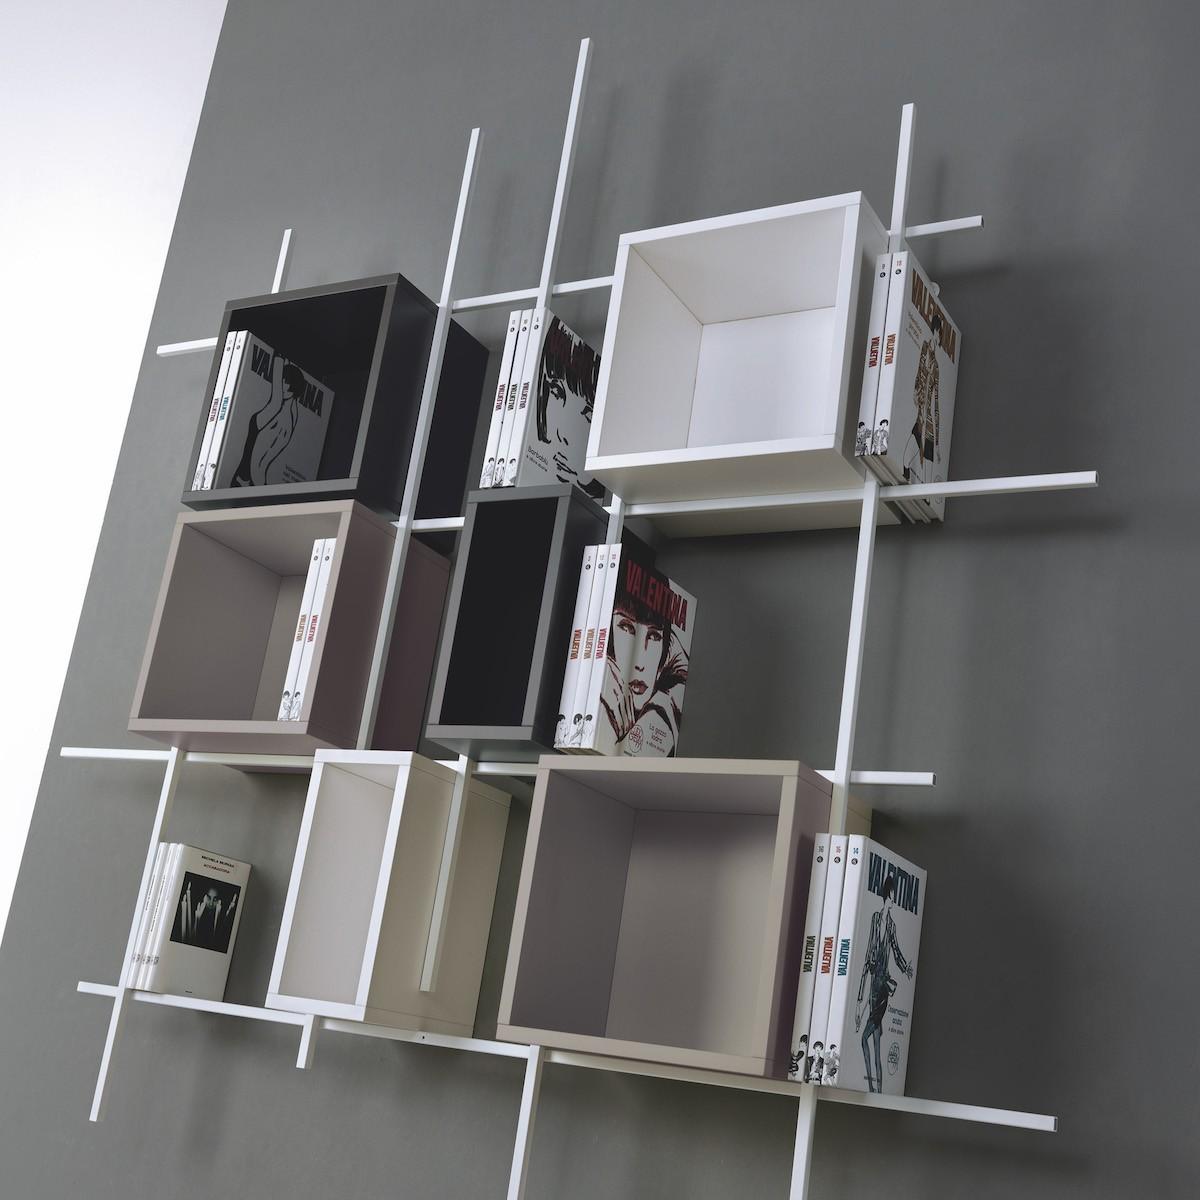 Libreria libra comp 32 da parete sospesa in acciaio design - Libreria a parete sospesa ...